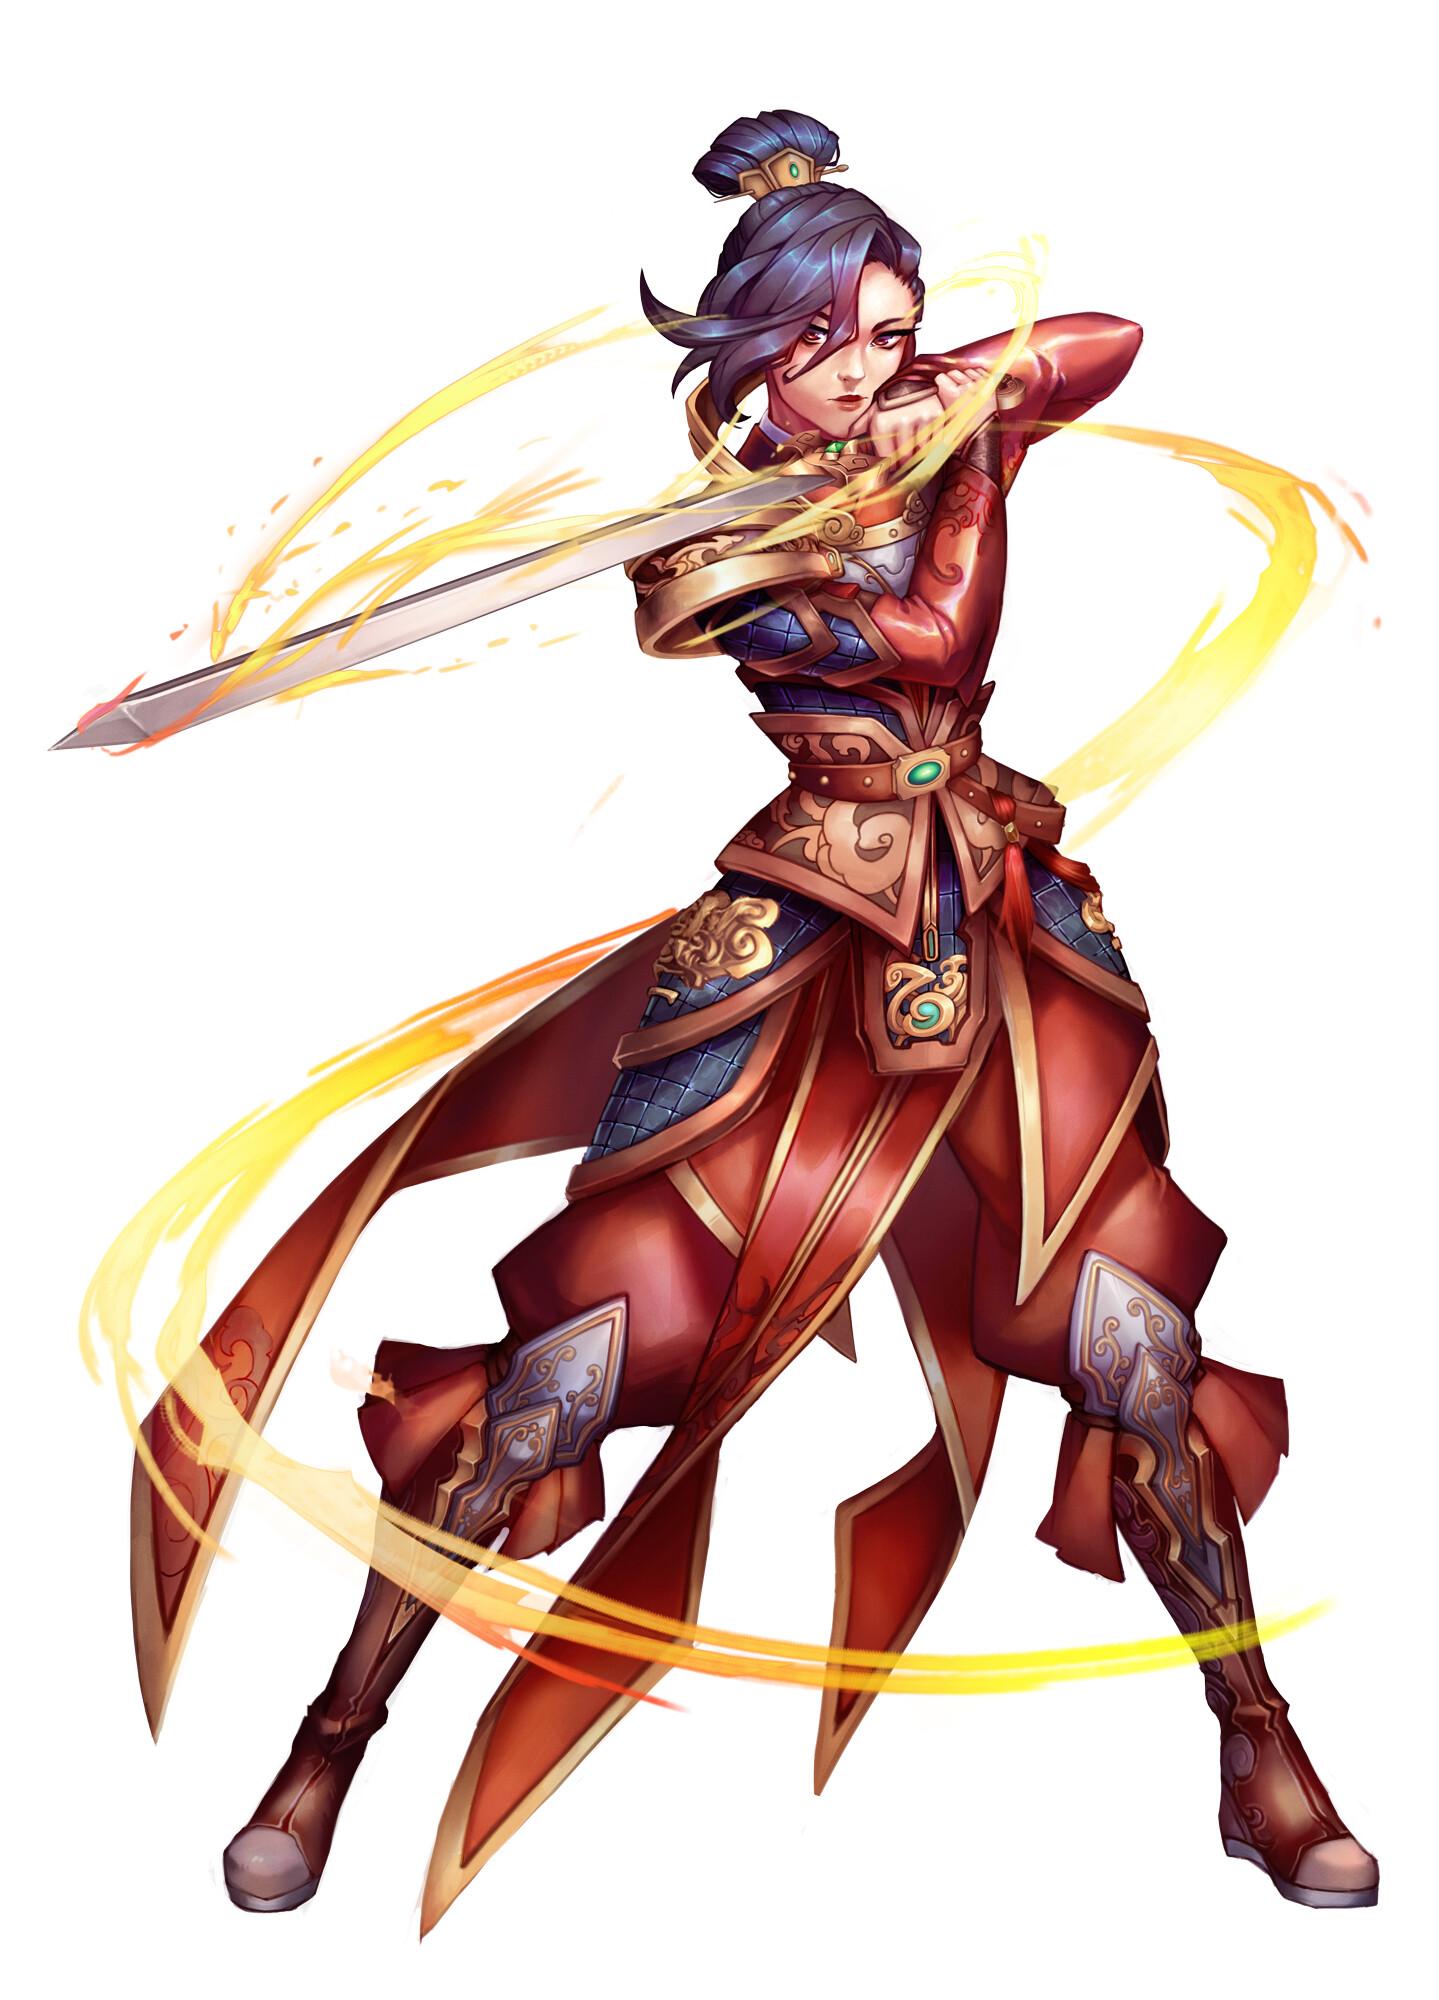 Mulan with FX